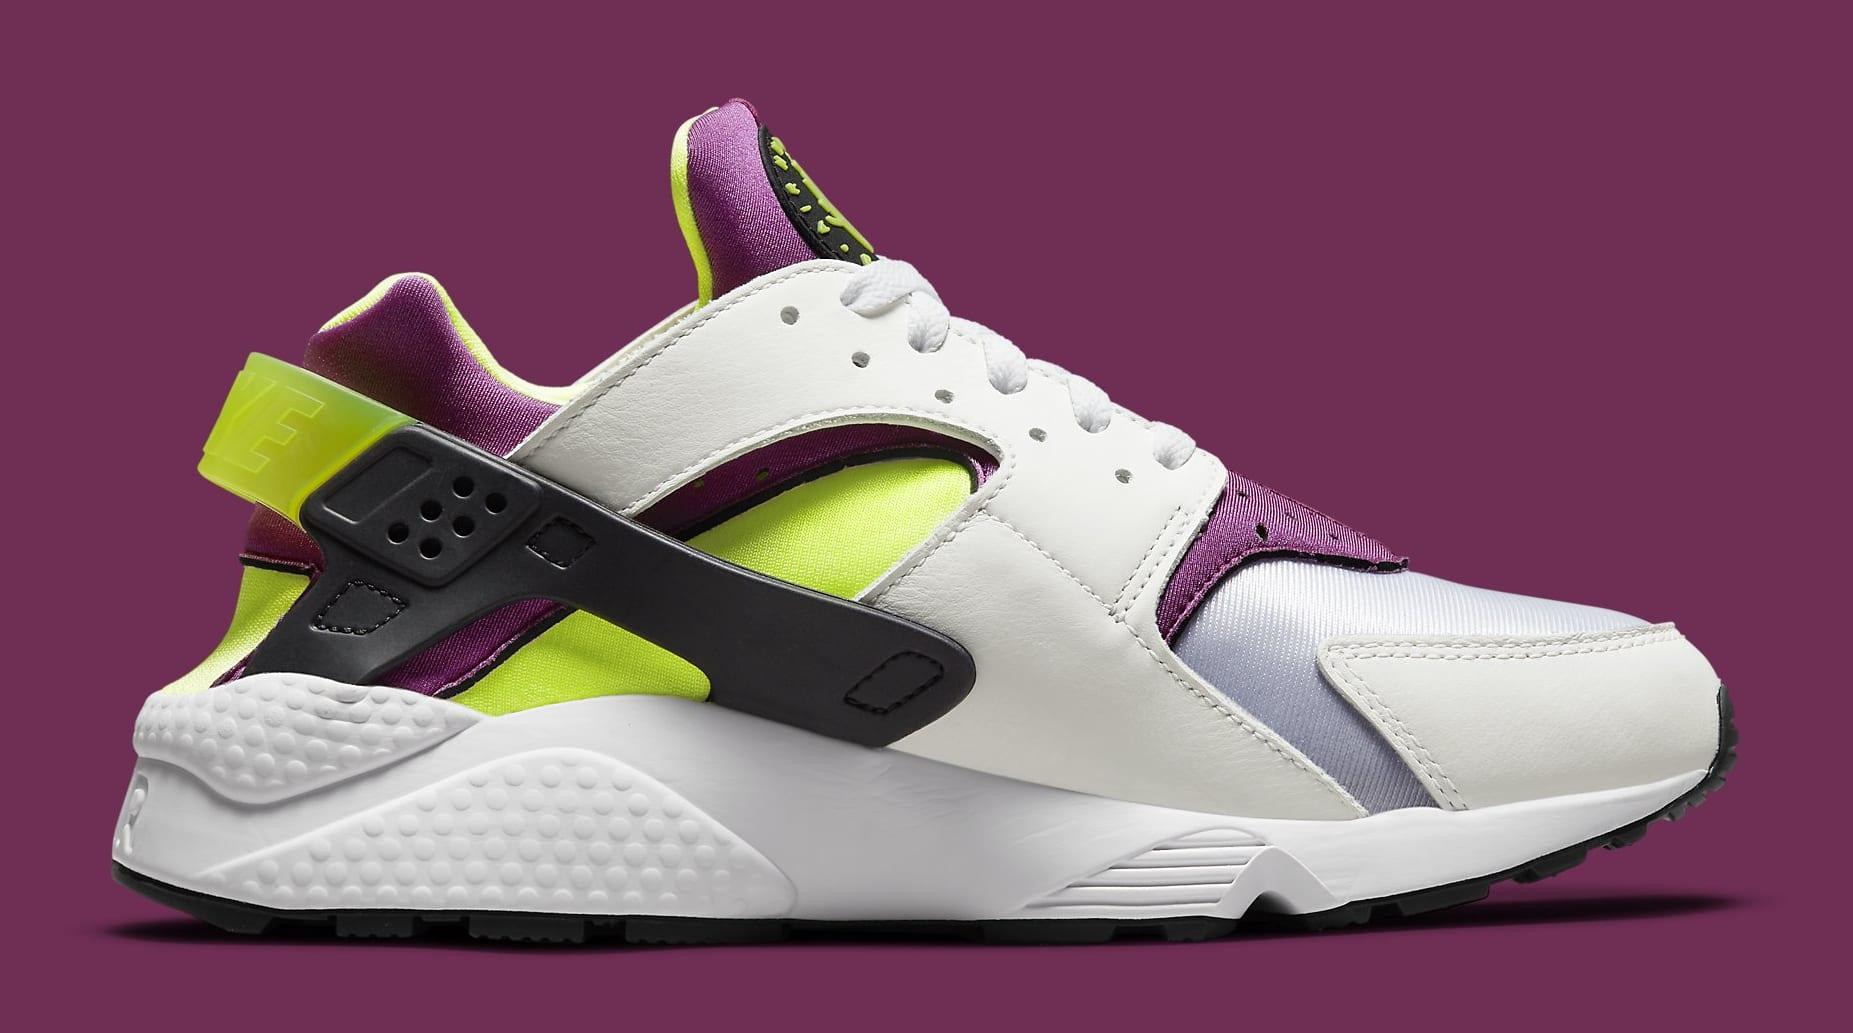 Nike Air Huarache Neon Yellow/Magenta DD1068-104 Medial